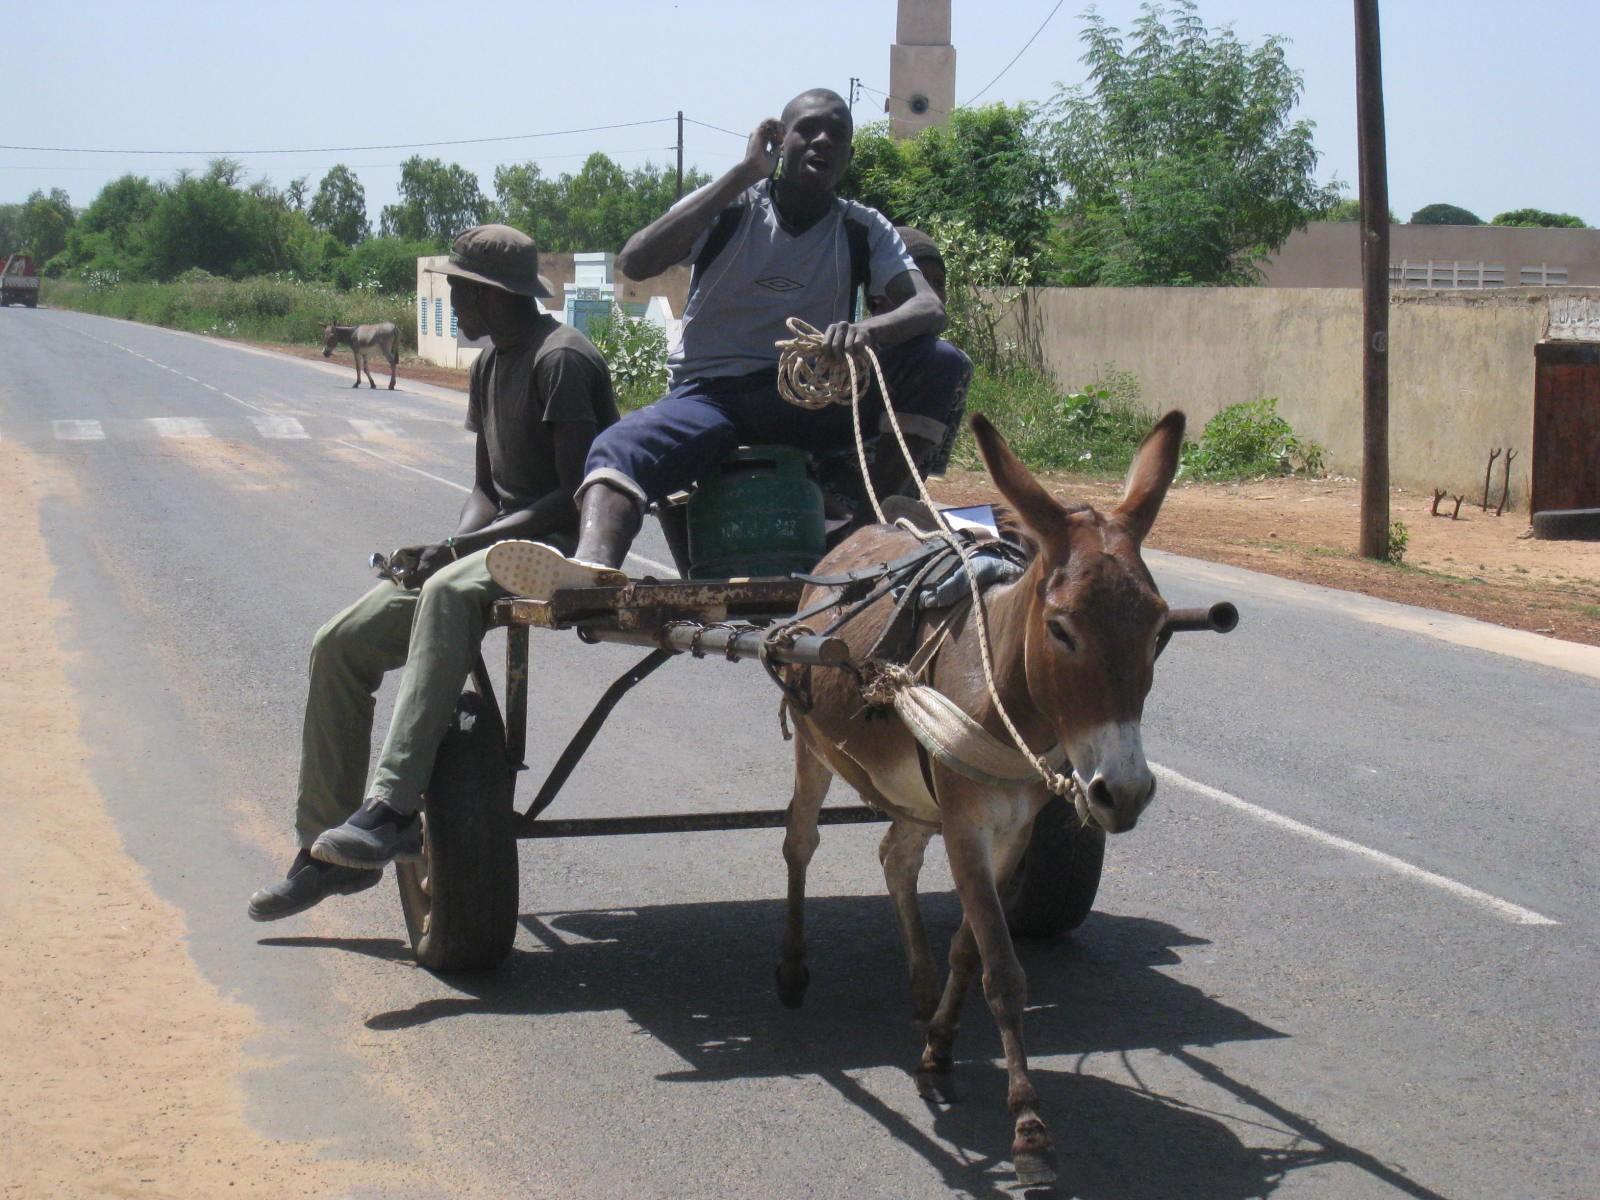 Un transport commun